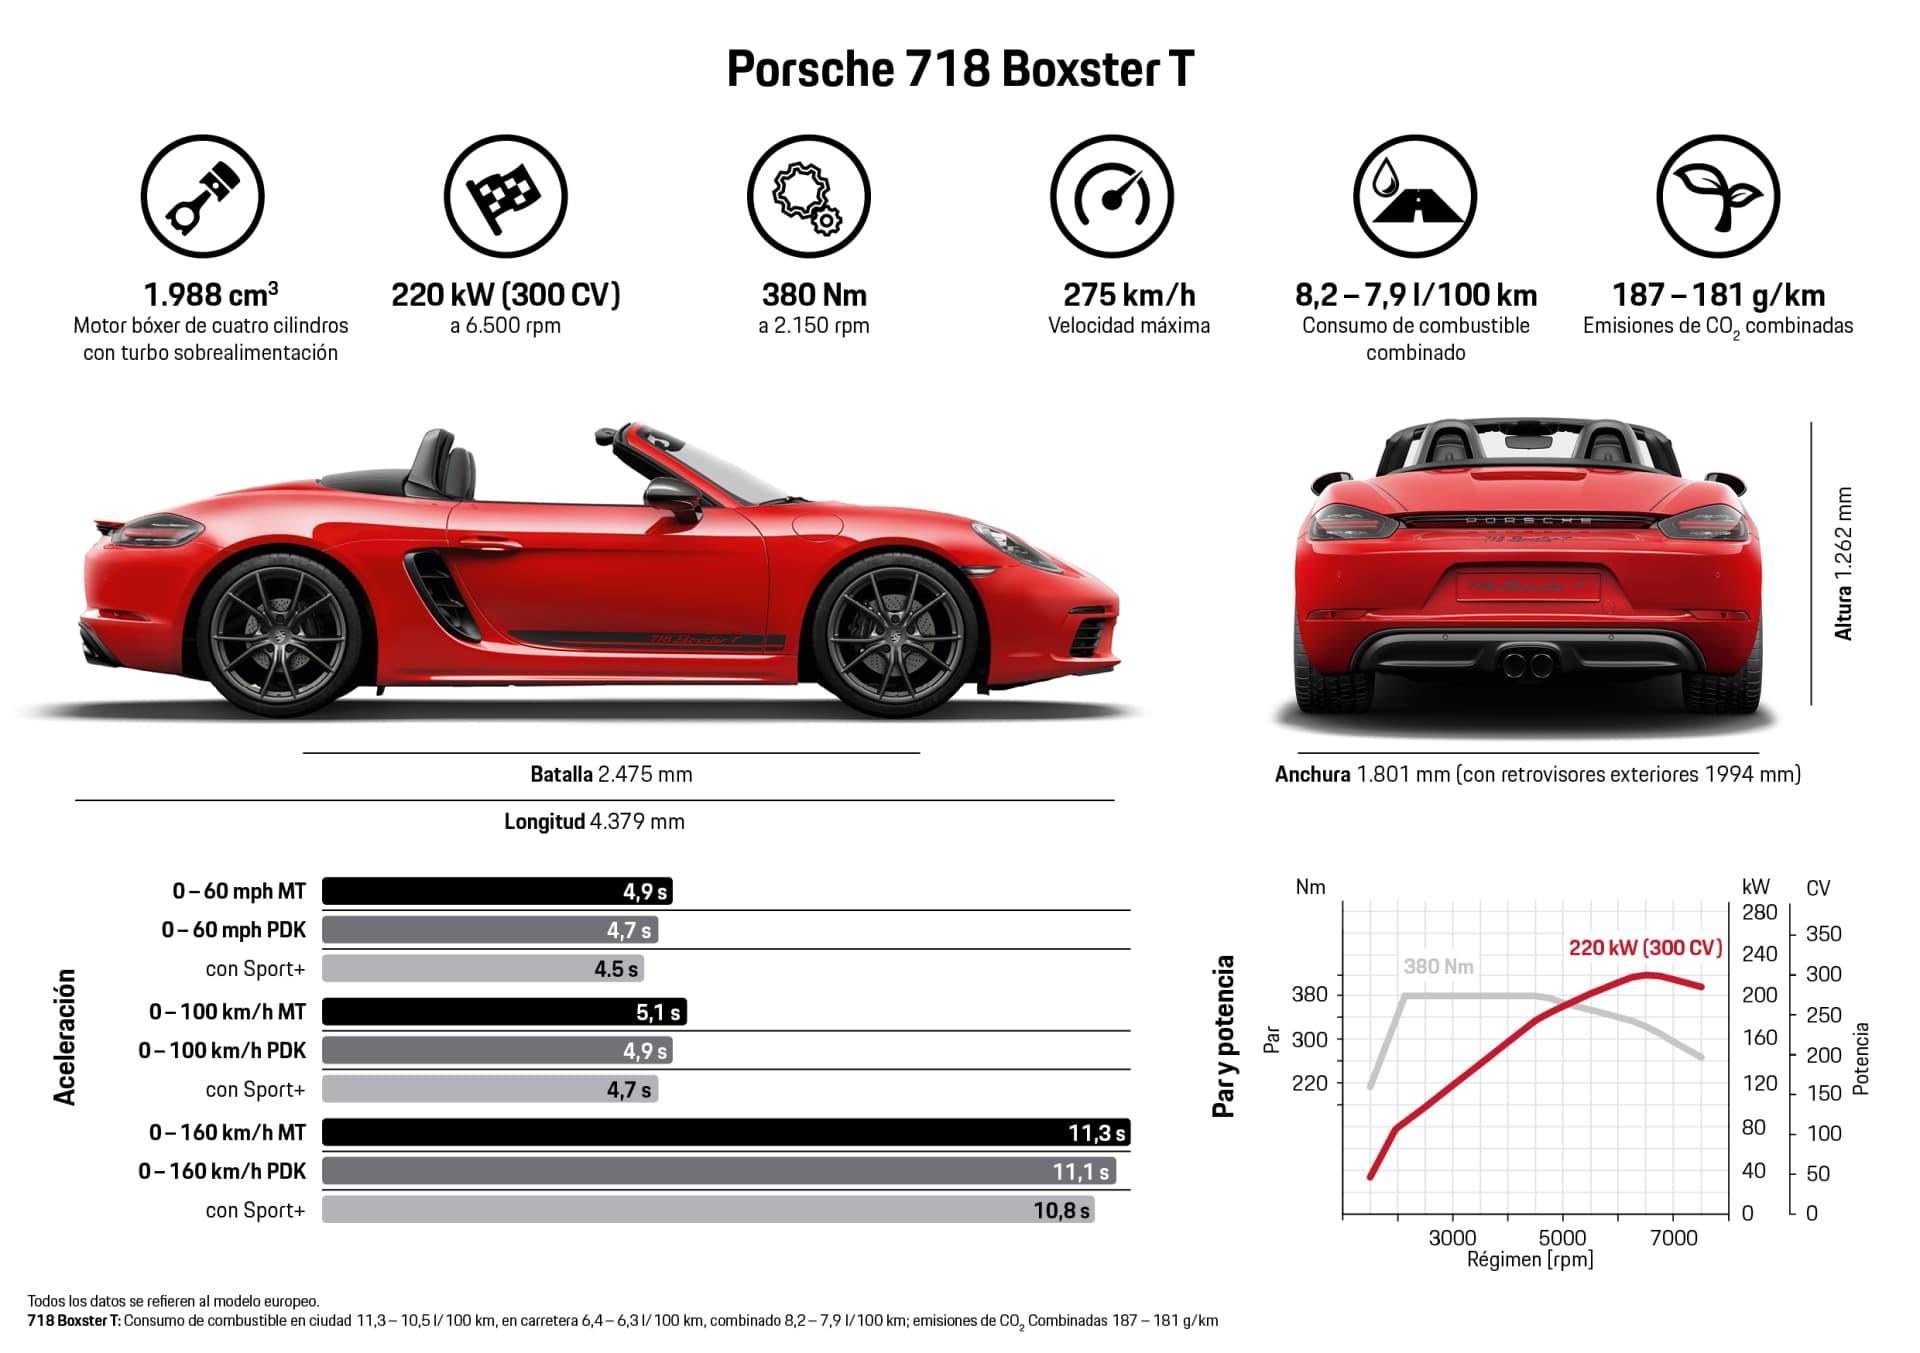 Porsche 718 Cayman Boxster T Dm 13